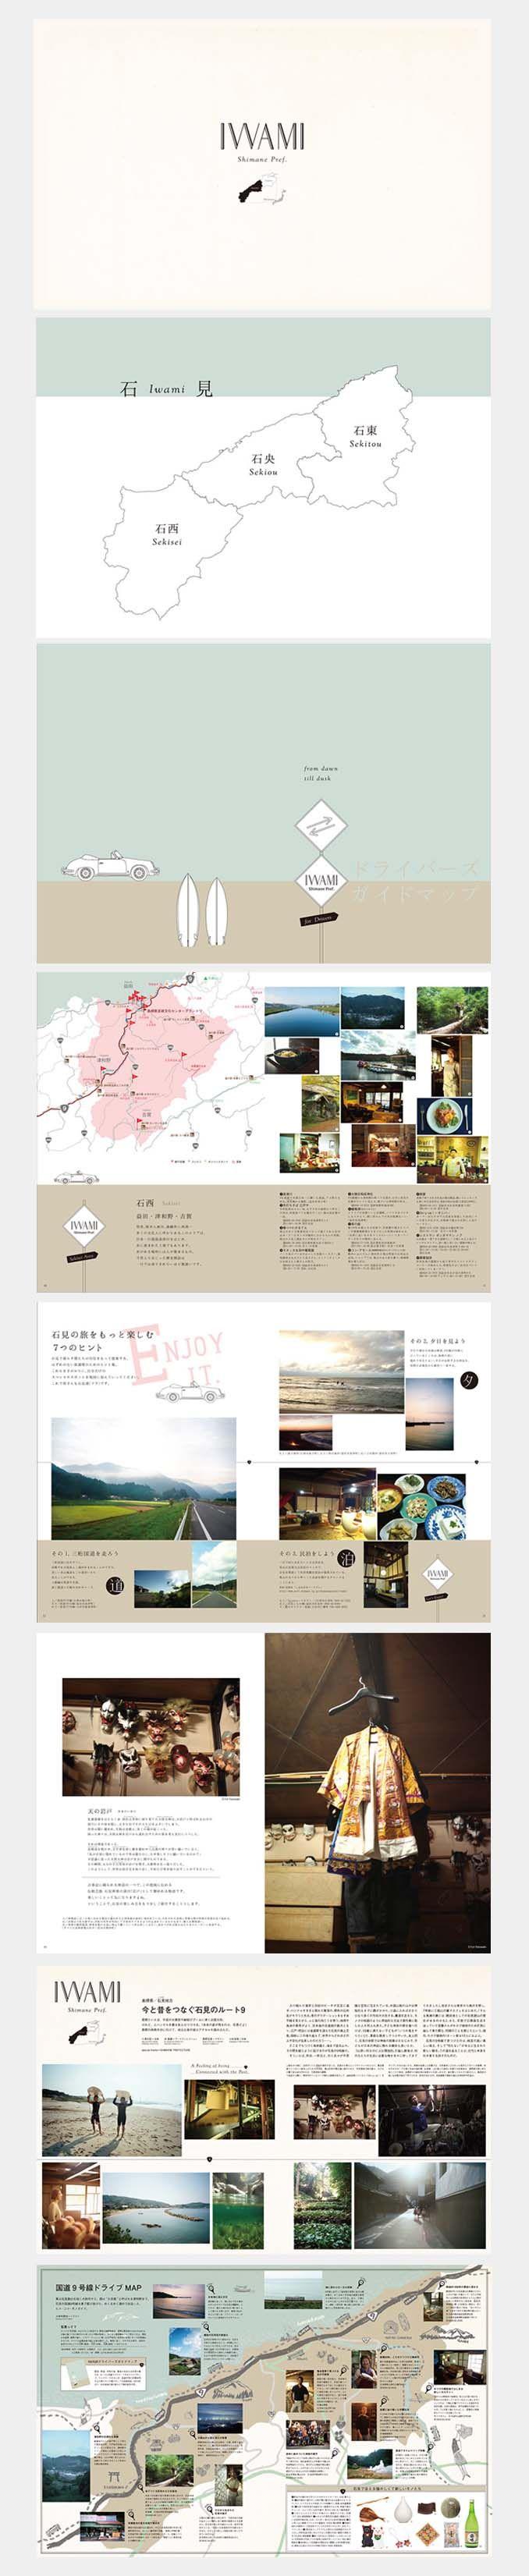 益田工房 島根県石見地方観光マップ